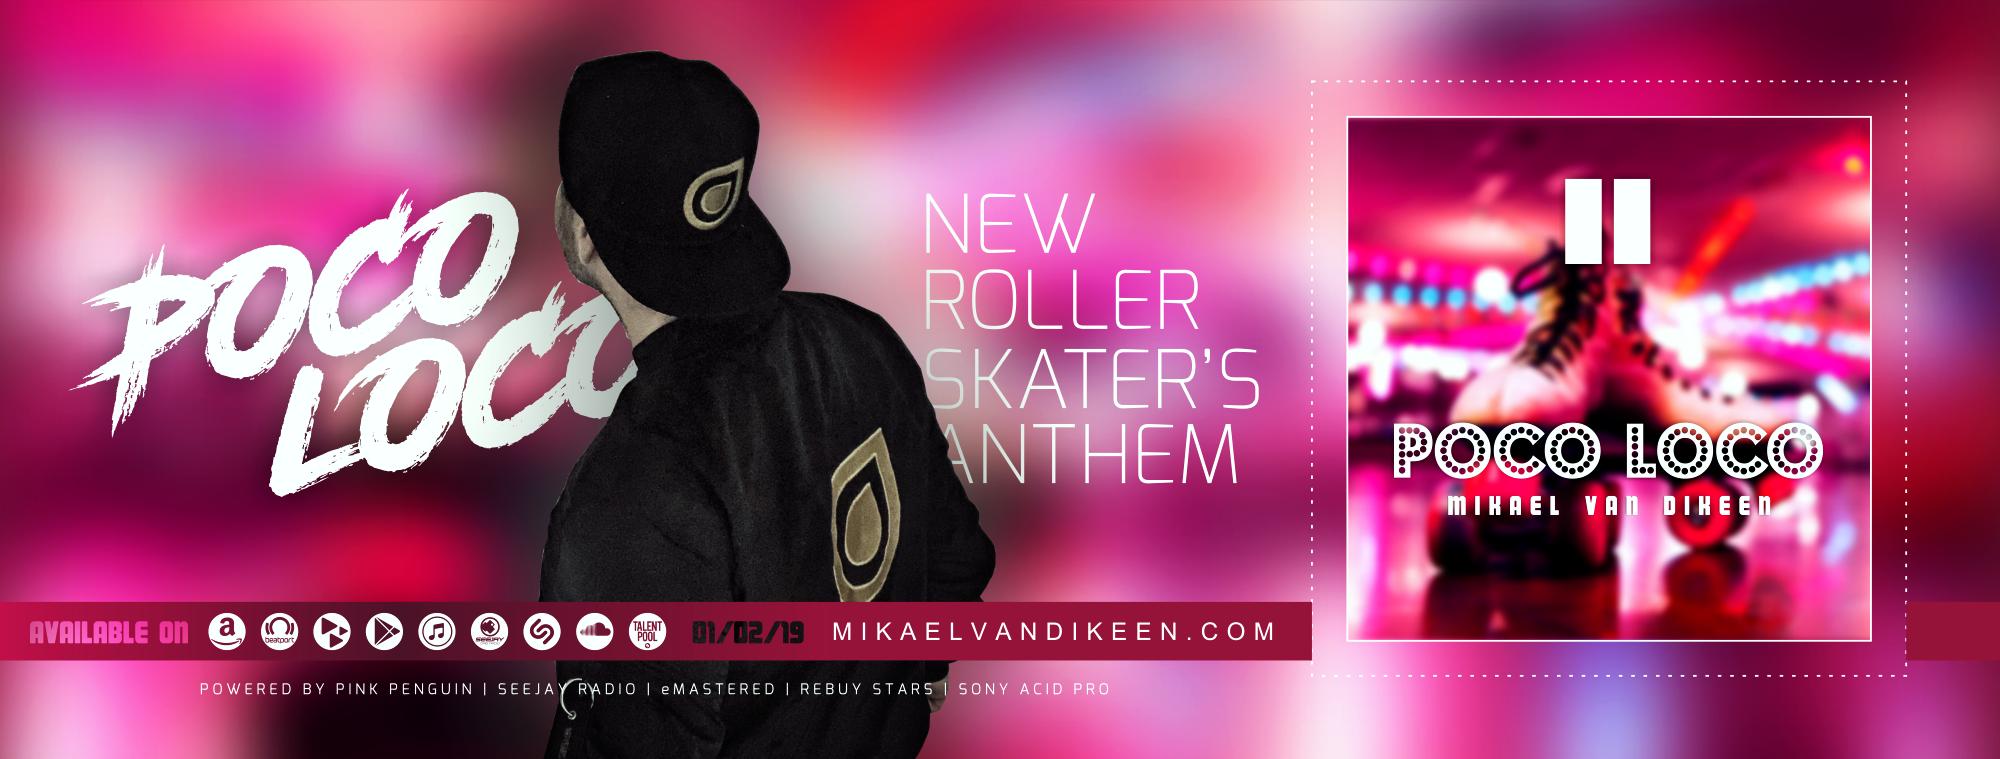 Mikael van Dikeen - Poco Loco - head web - banner